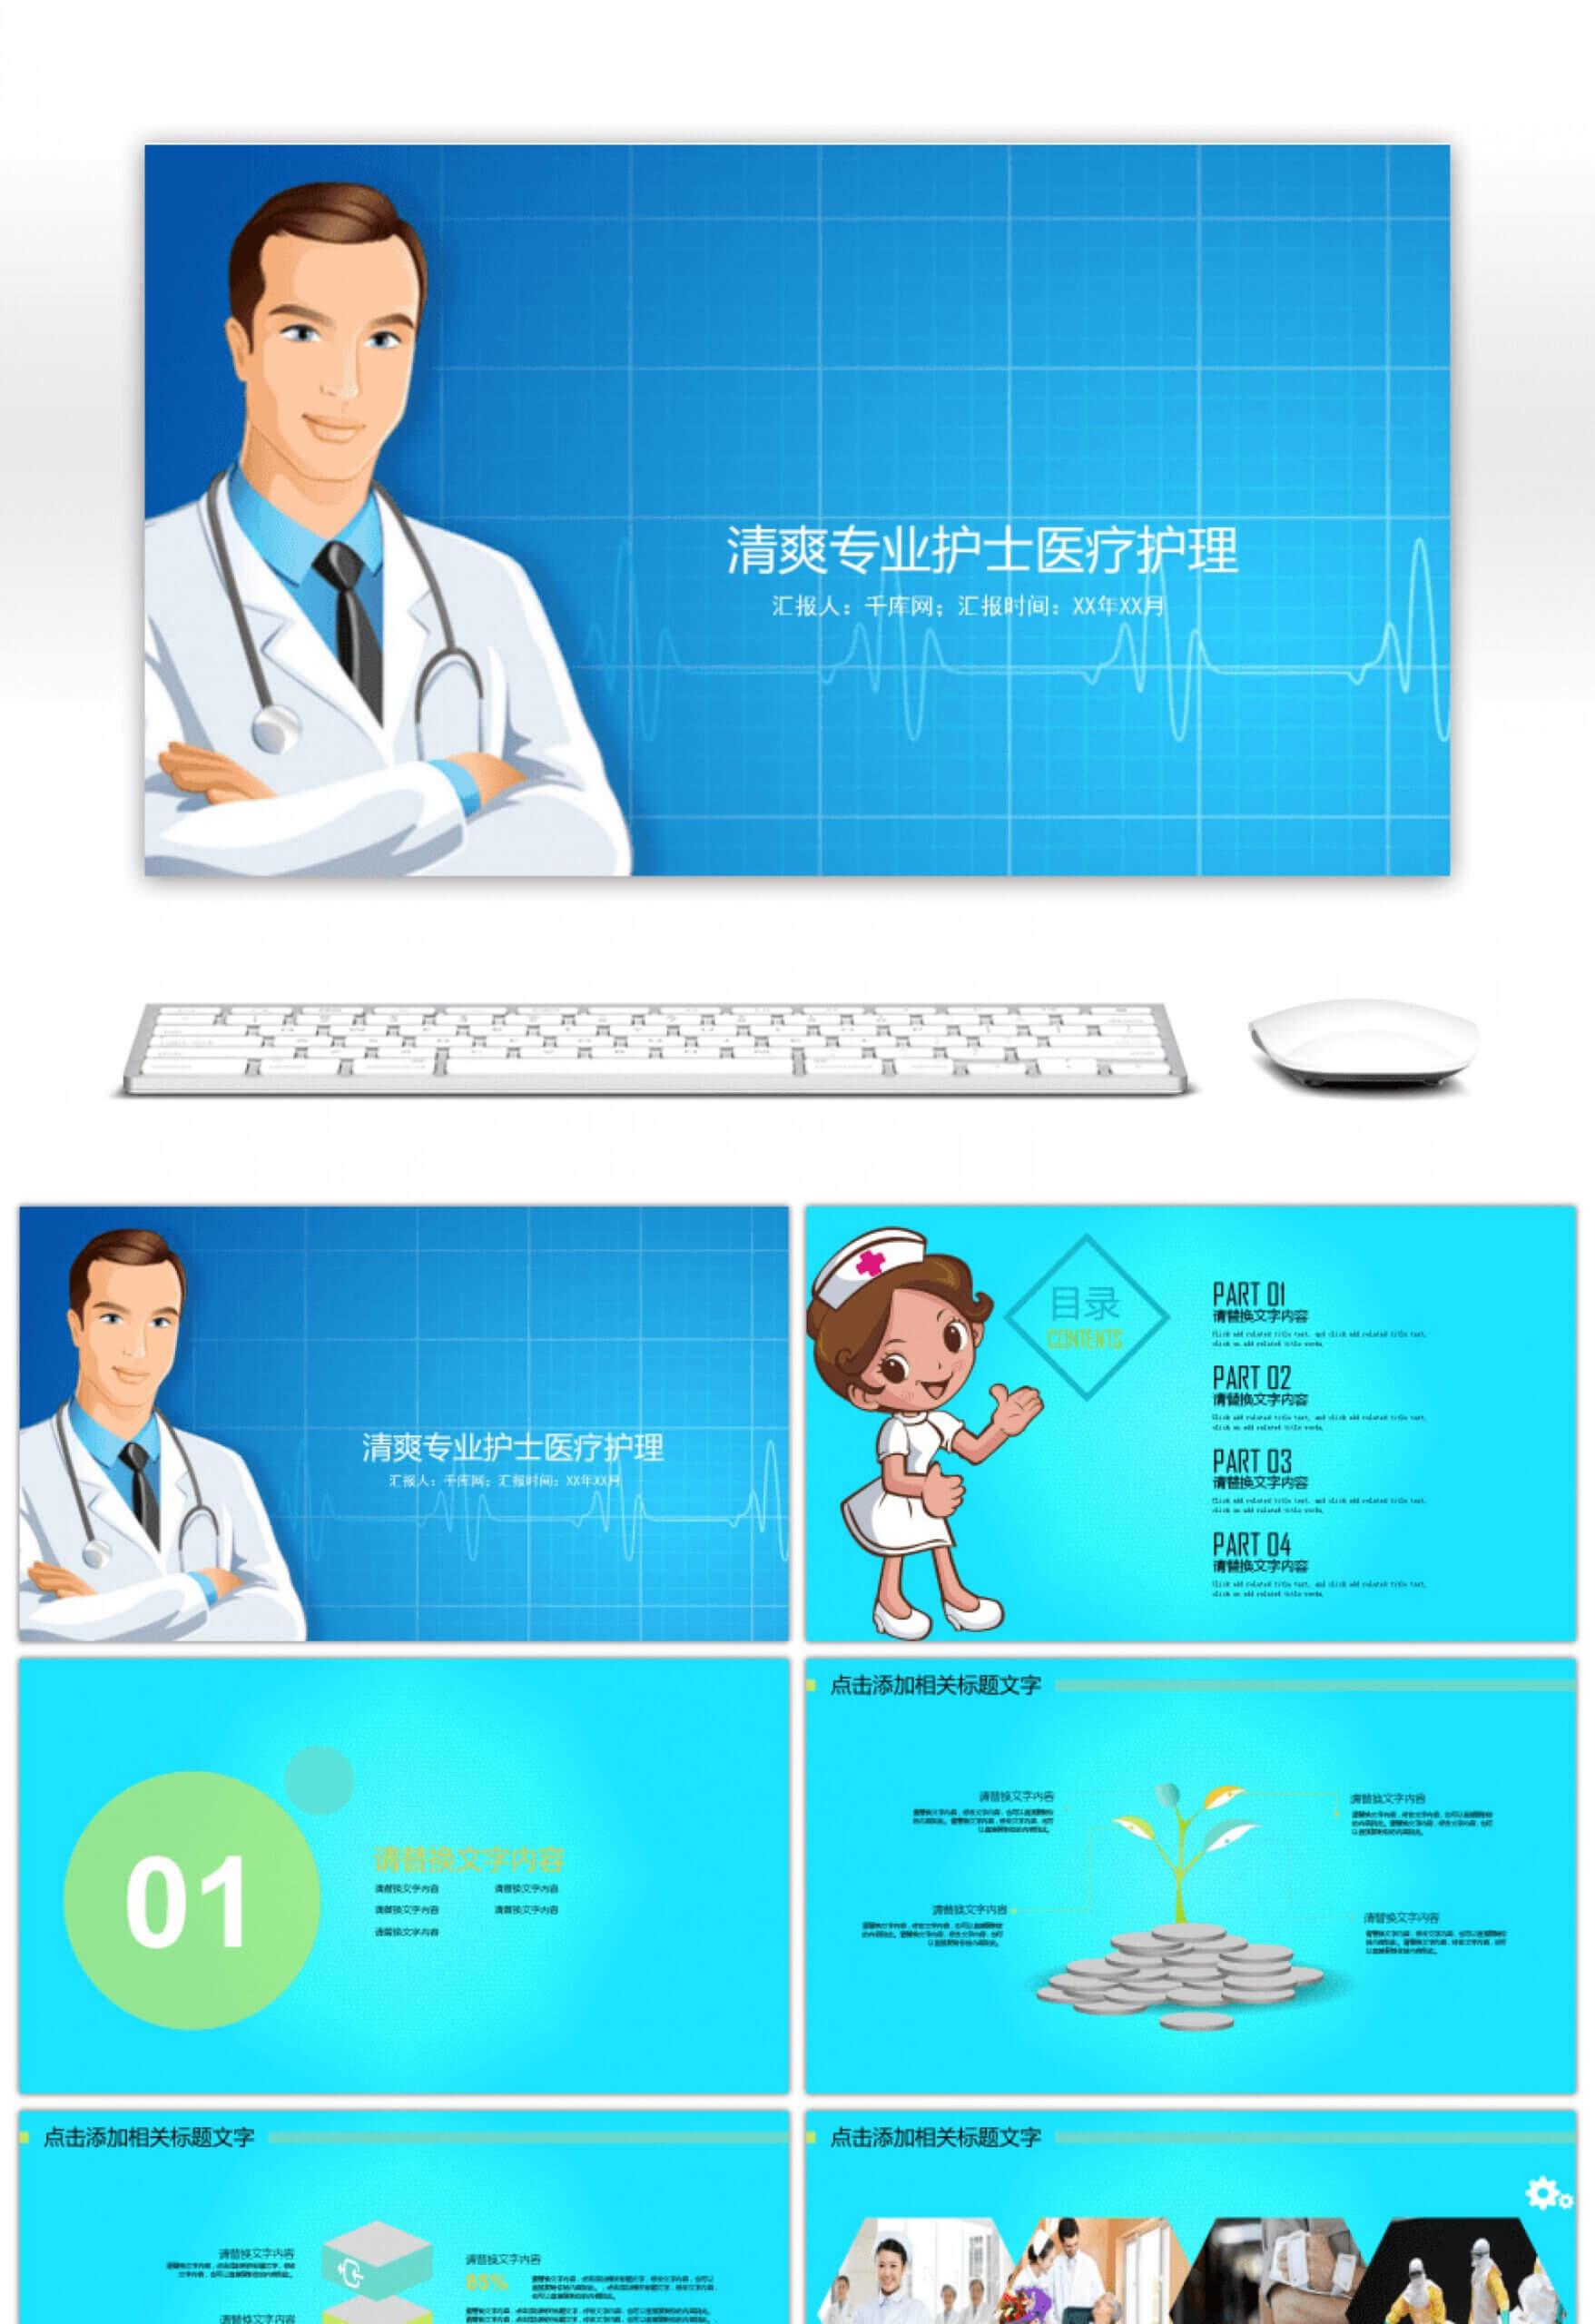 011 C43Fe00076882A9Bc49C67C7A4Cb50F1 Jpg 0 Free Nursing With Regard To Free Nursing Powerpoint Templates